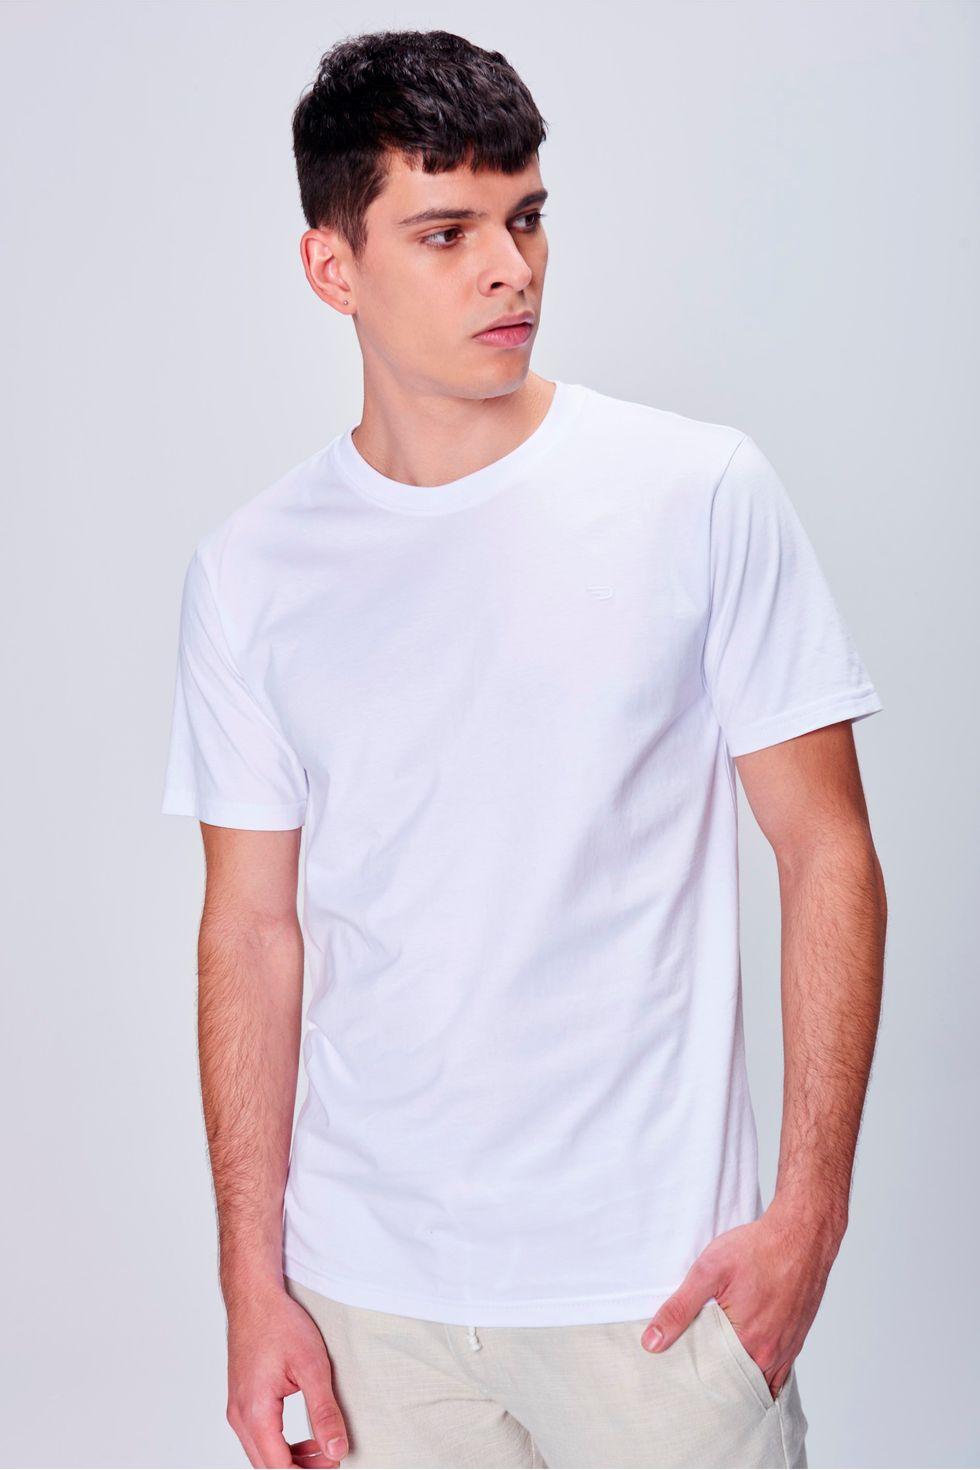 569f6a02b1b0e Camiseta Masculina Básica - Damyller